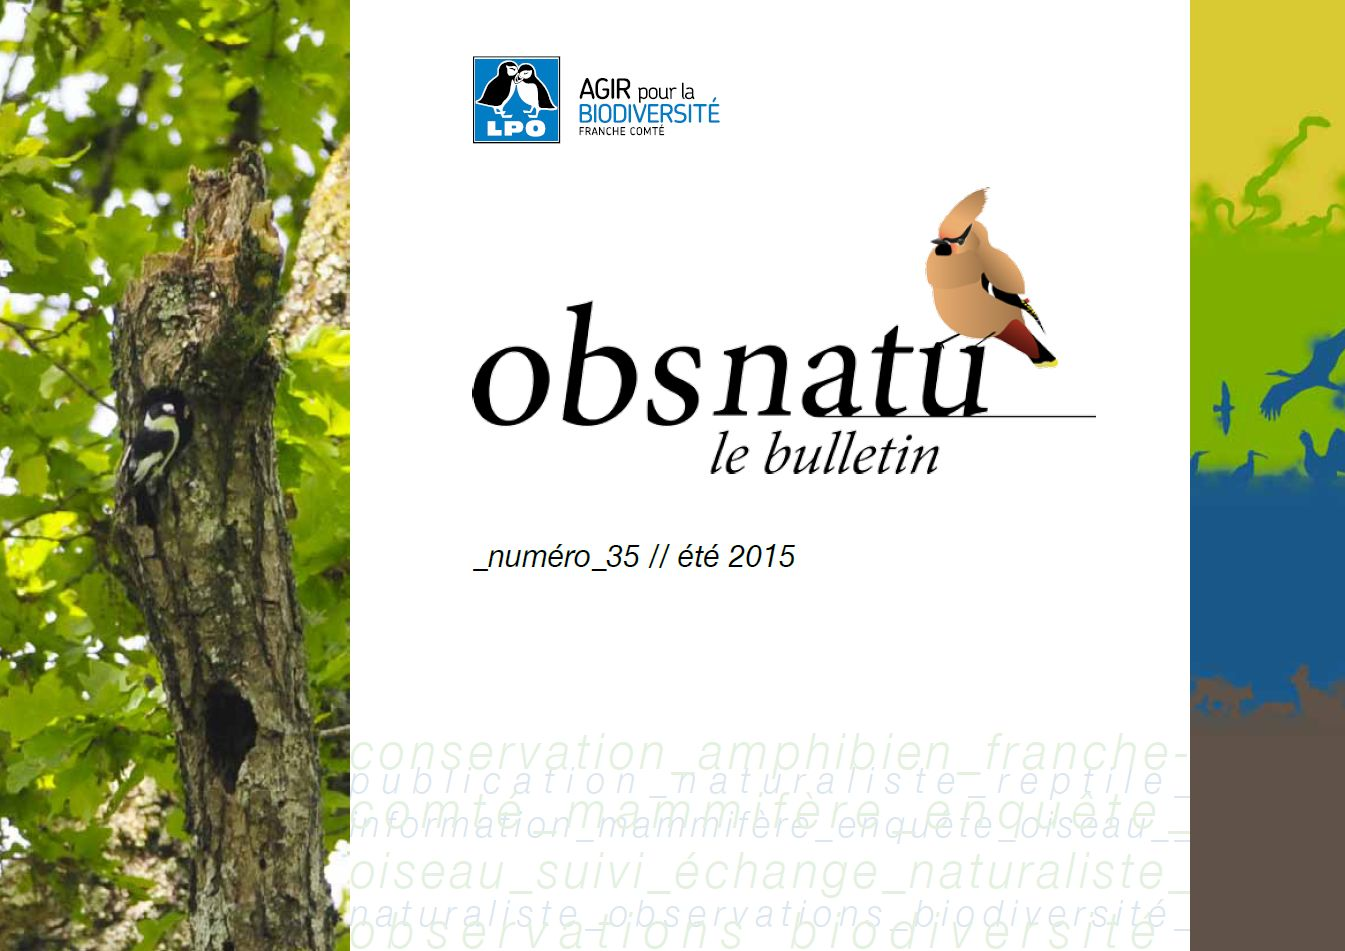 http://files.biolovision.net/franche-comte.lpo.fr/userfiles/publications/Obsnatubulls/Obsnatun35ete2015couv.jpg